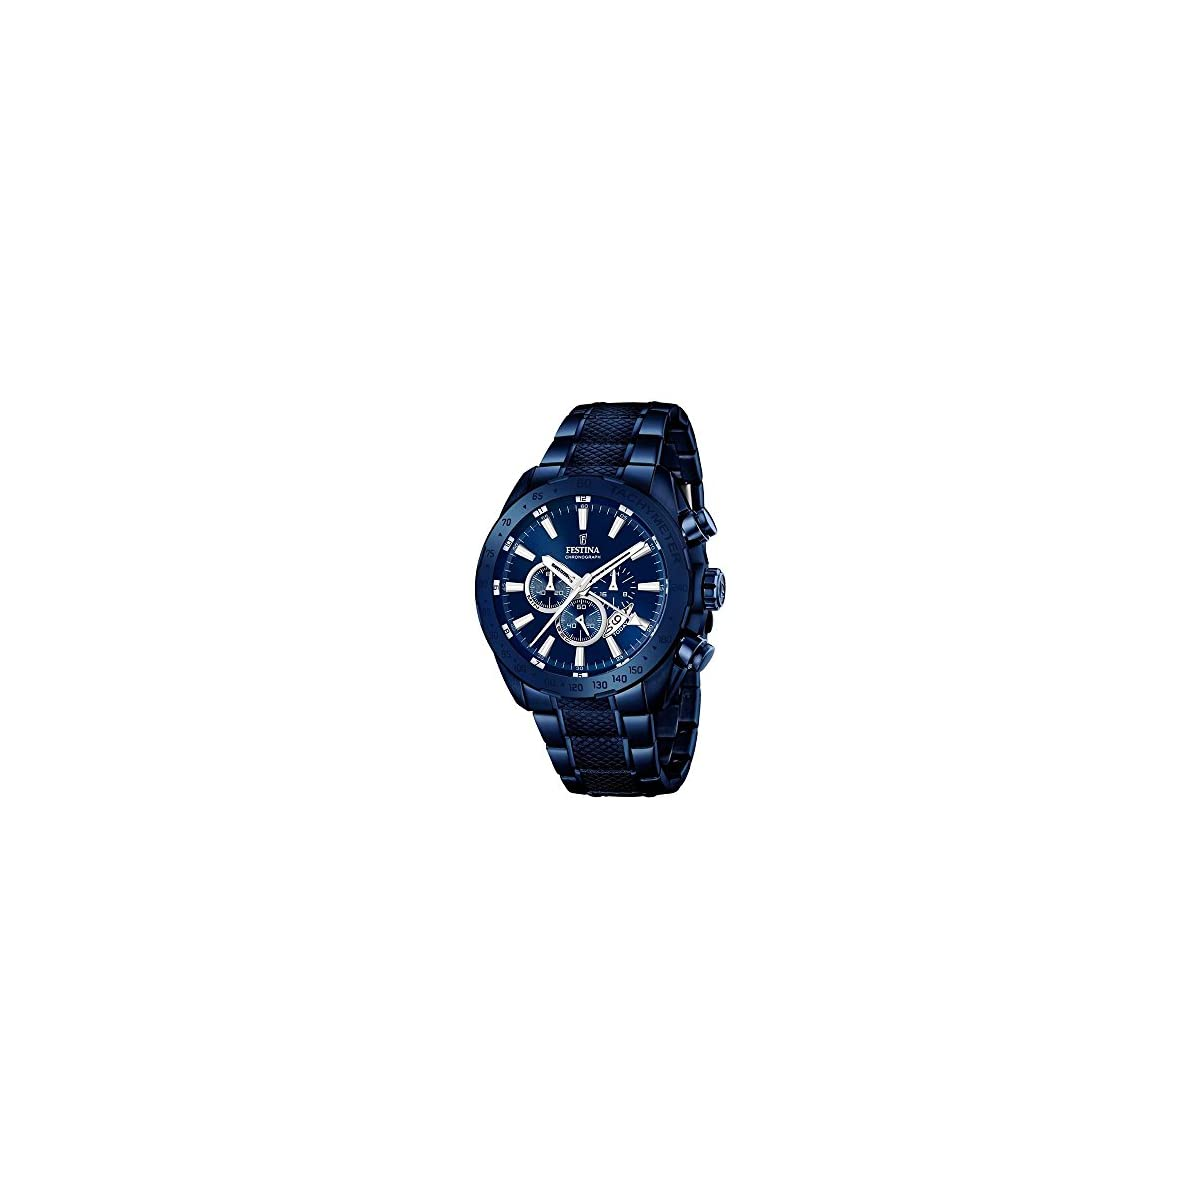 512zne1xcoL. SS1200  - Festina F16887/1 - Reloj para hombre esfera cronográfica, correa de acero inoxidable, azul